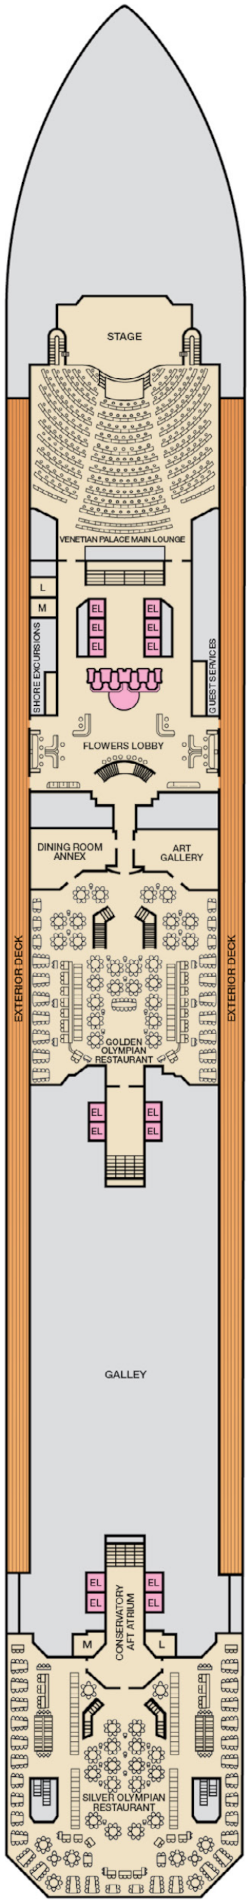 Carnival Liberty Lobby Deck Deck Plan